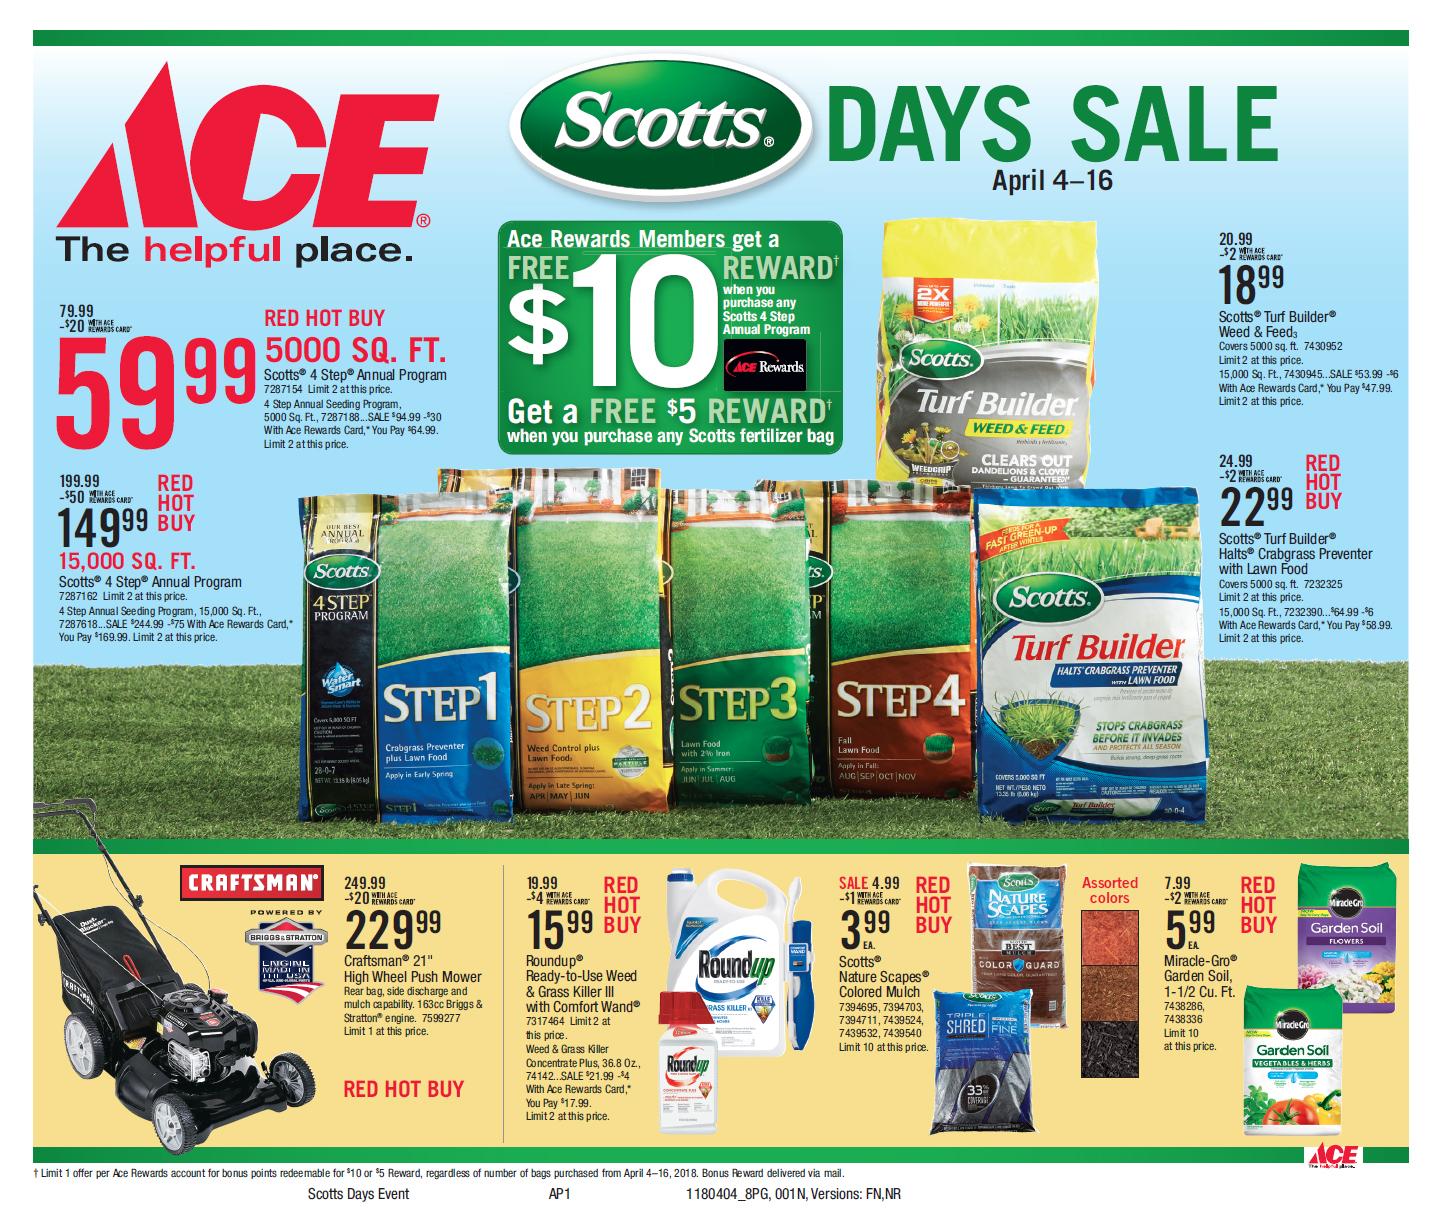 scotts days sale copy.jpg